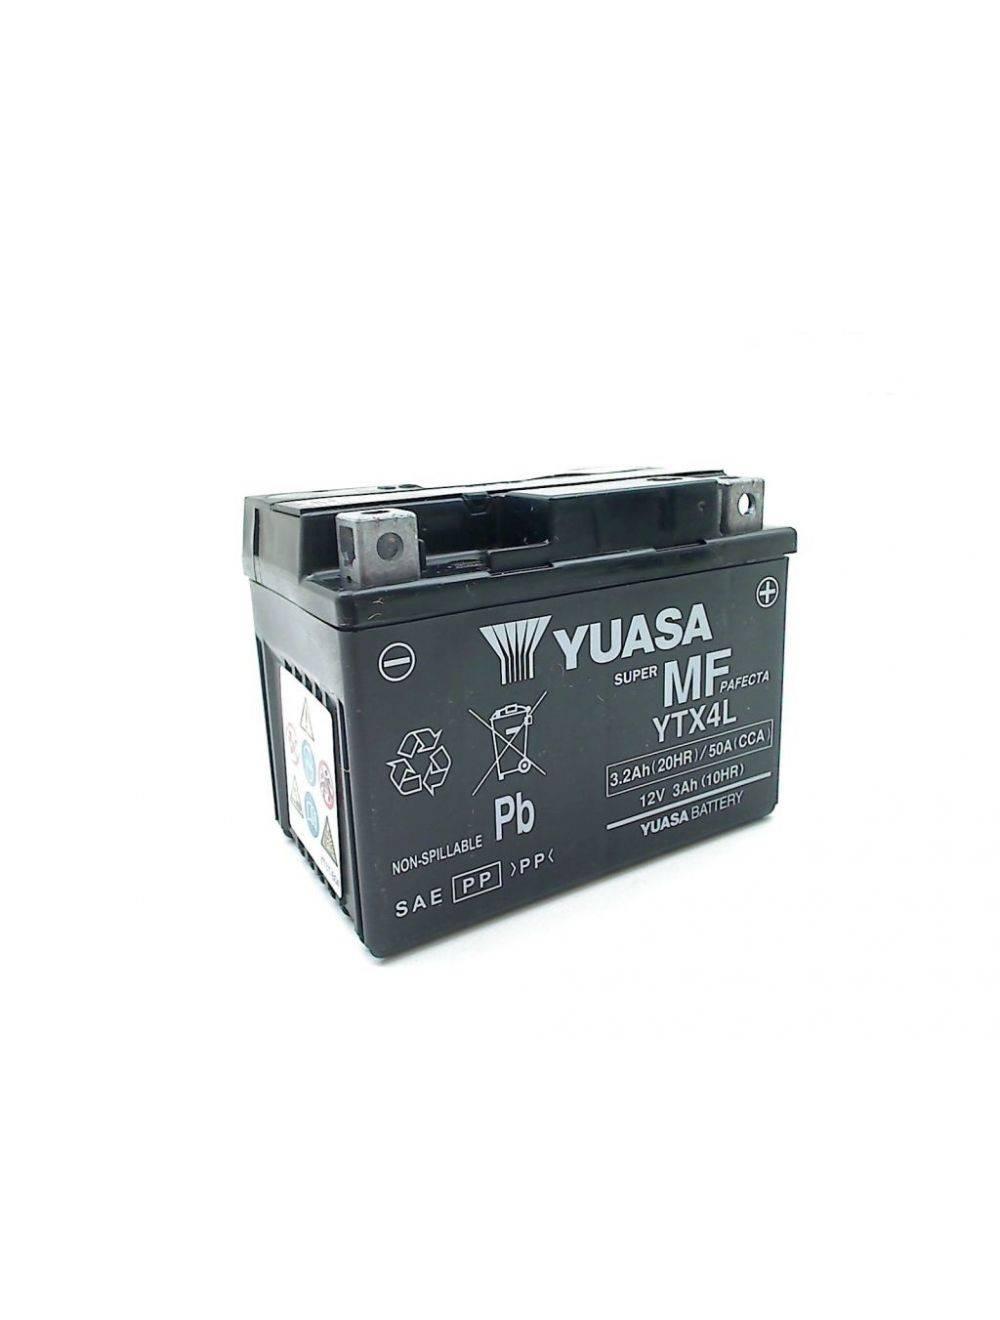 Battery for scooter or moped brand YUASA model BSDE YTX4L-12v 3Ah.